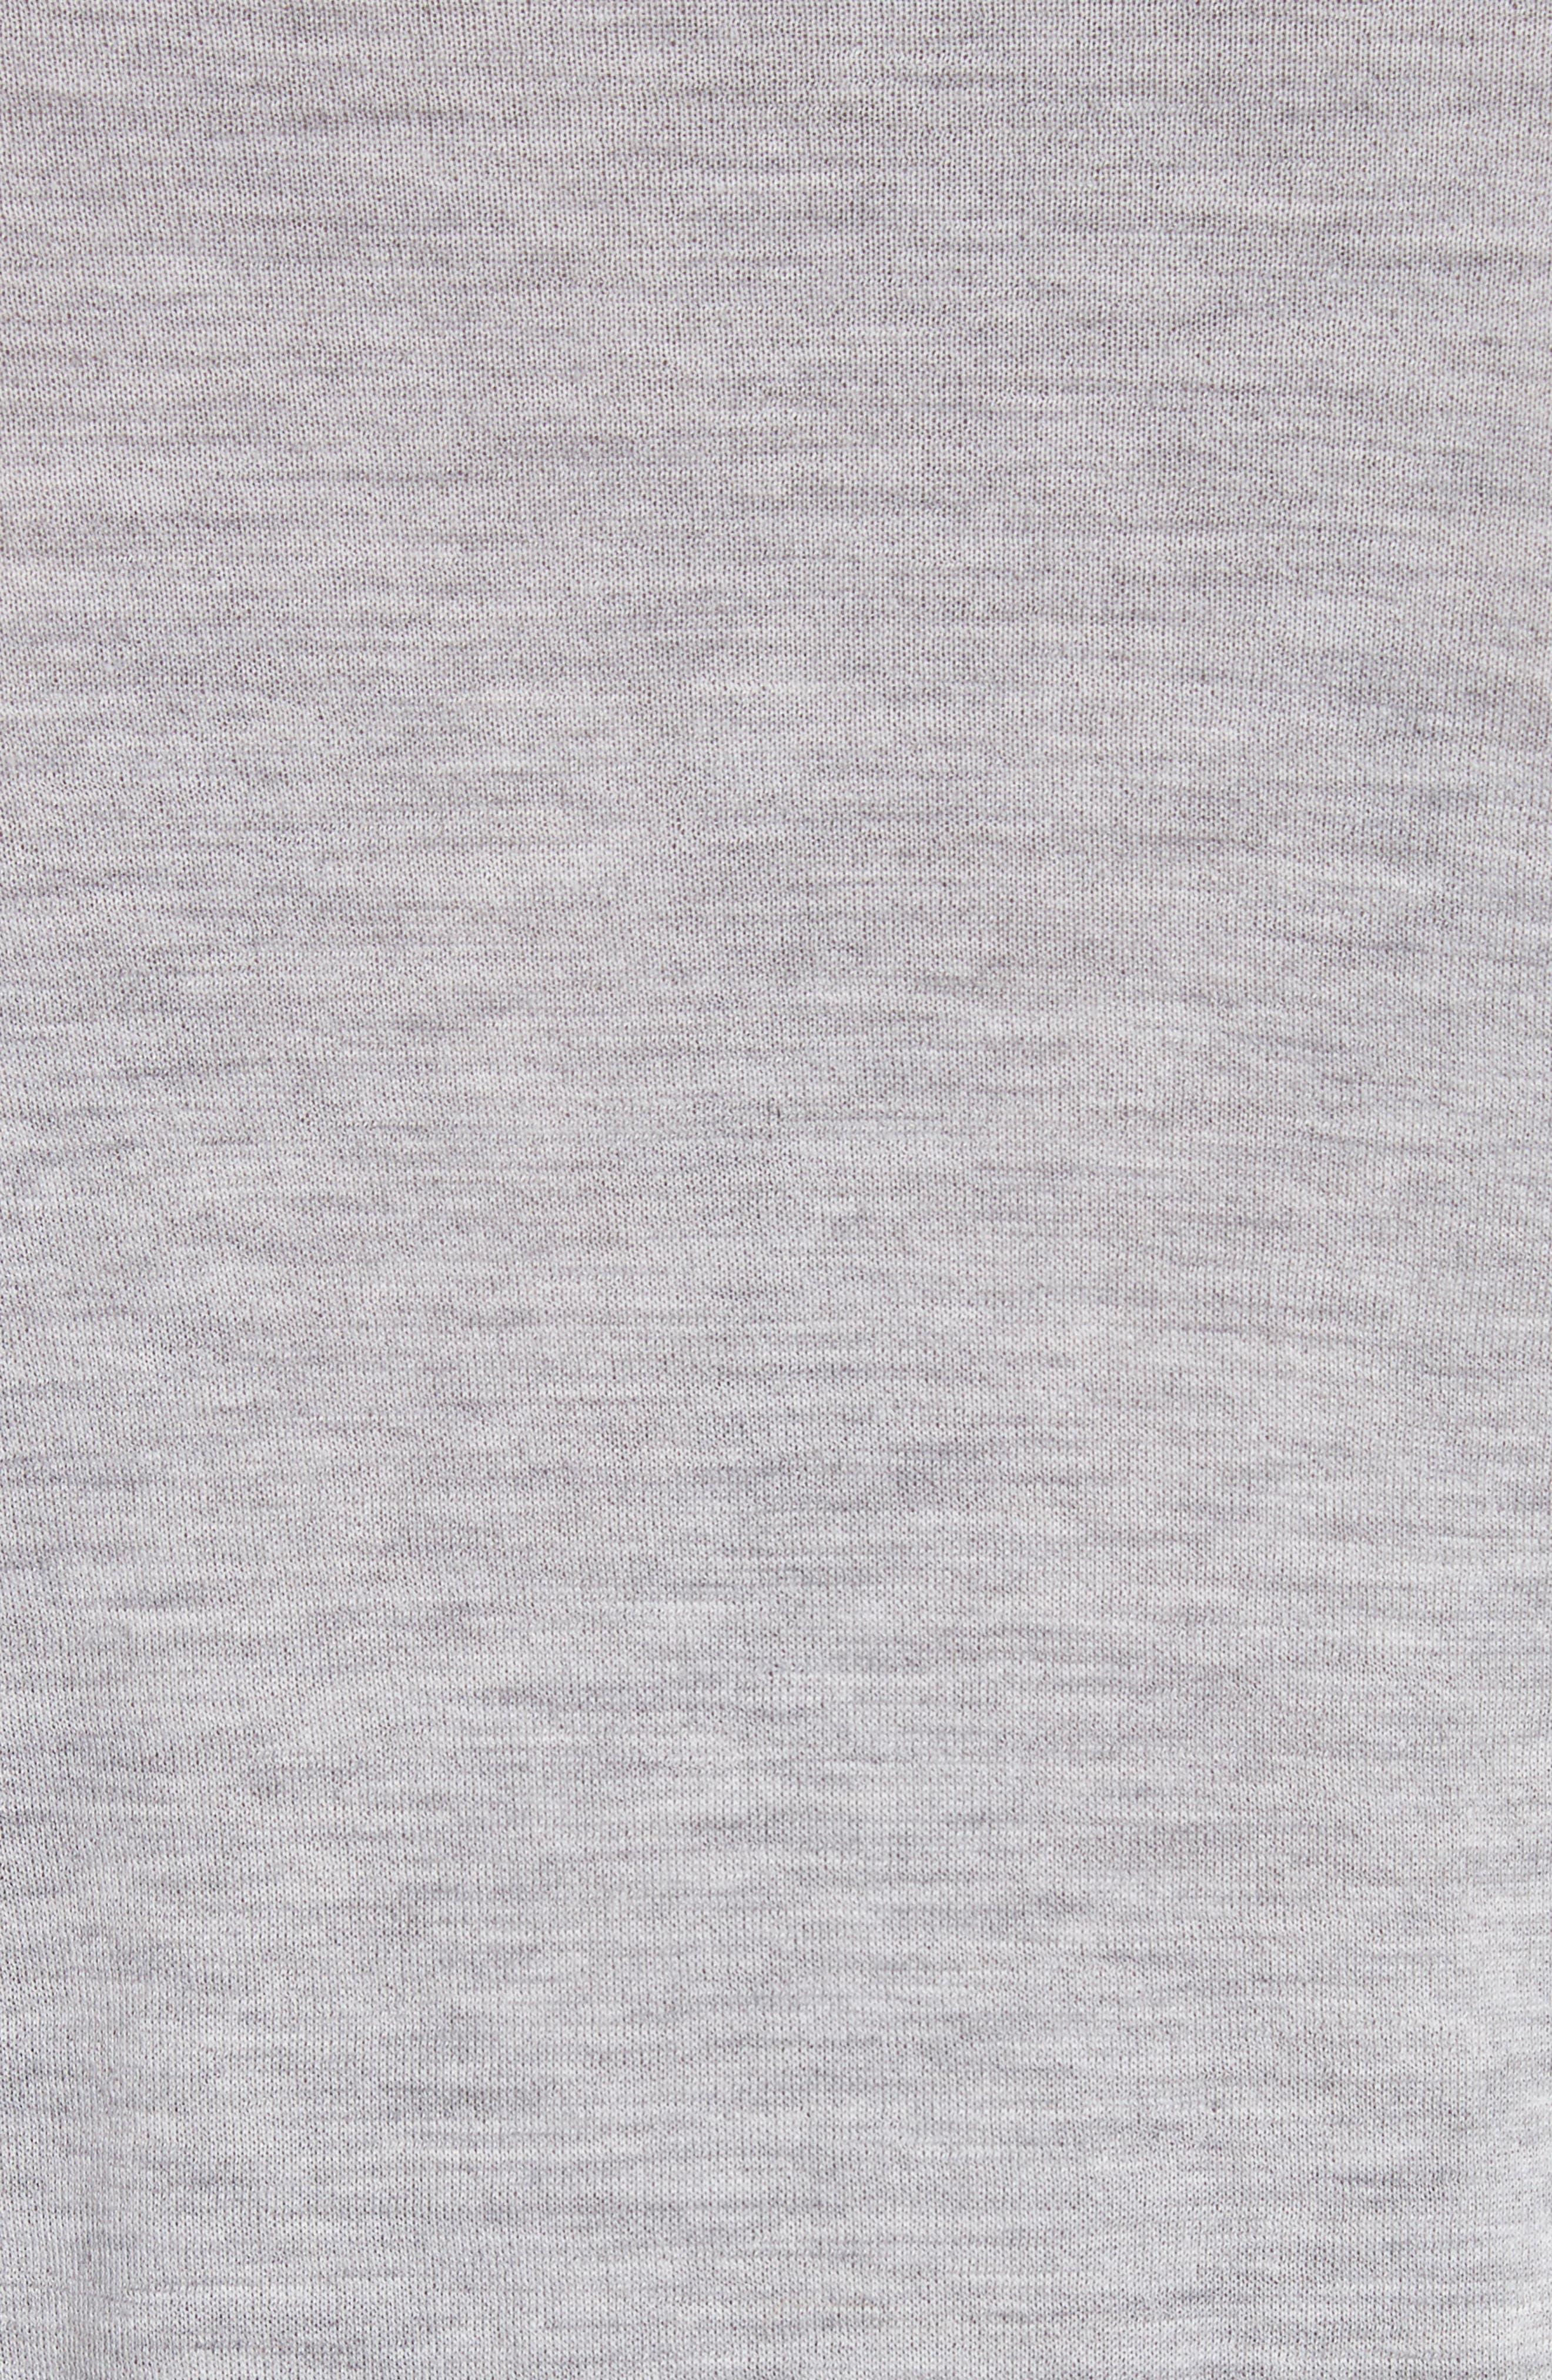 Cashmere Crewneck Sweater,                             Alternate thumbnail 5, color,                             055